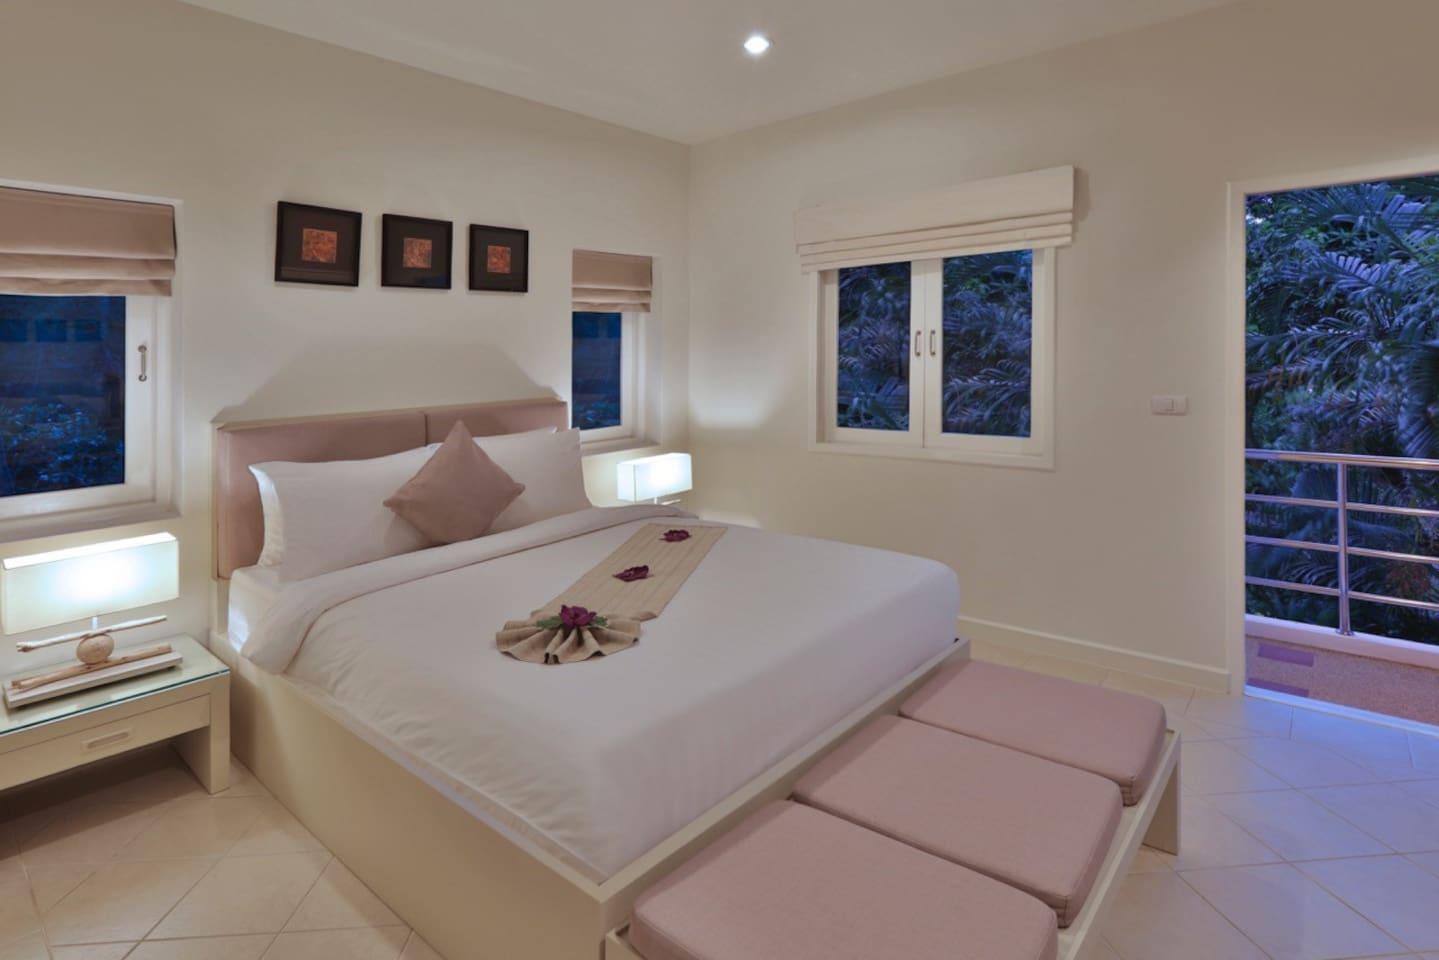 The Gardens - Luxury 2 Bedroom Villas with Pool